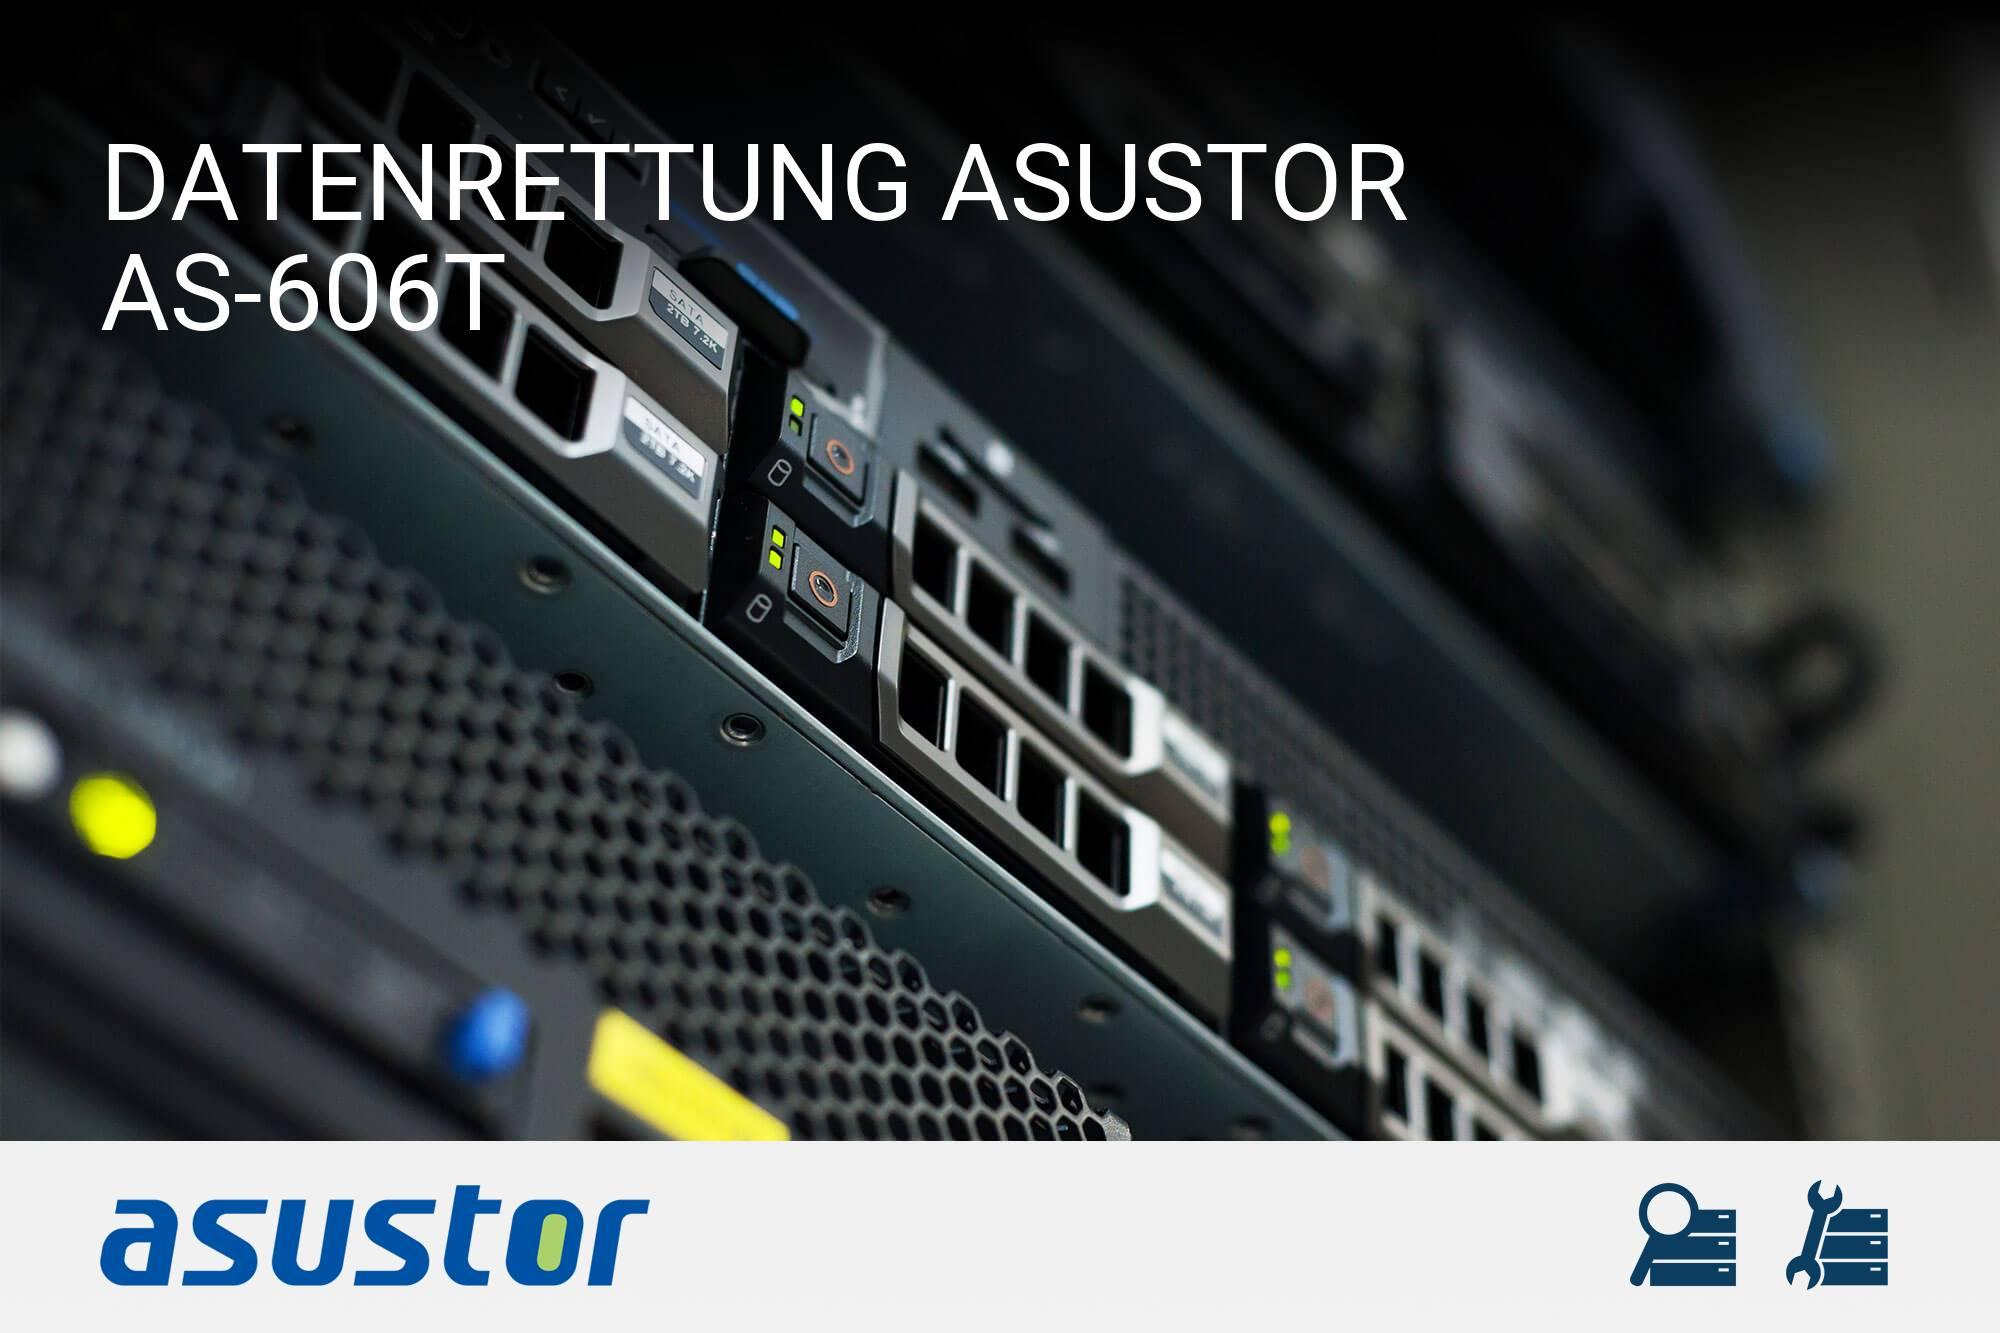 Asustor AS-606T